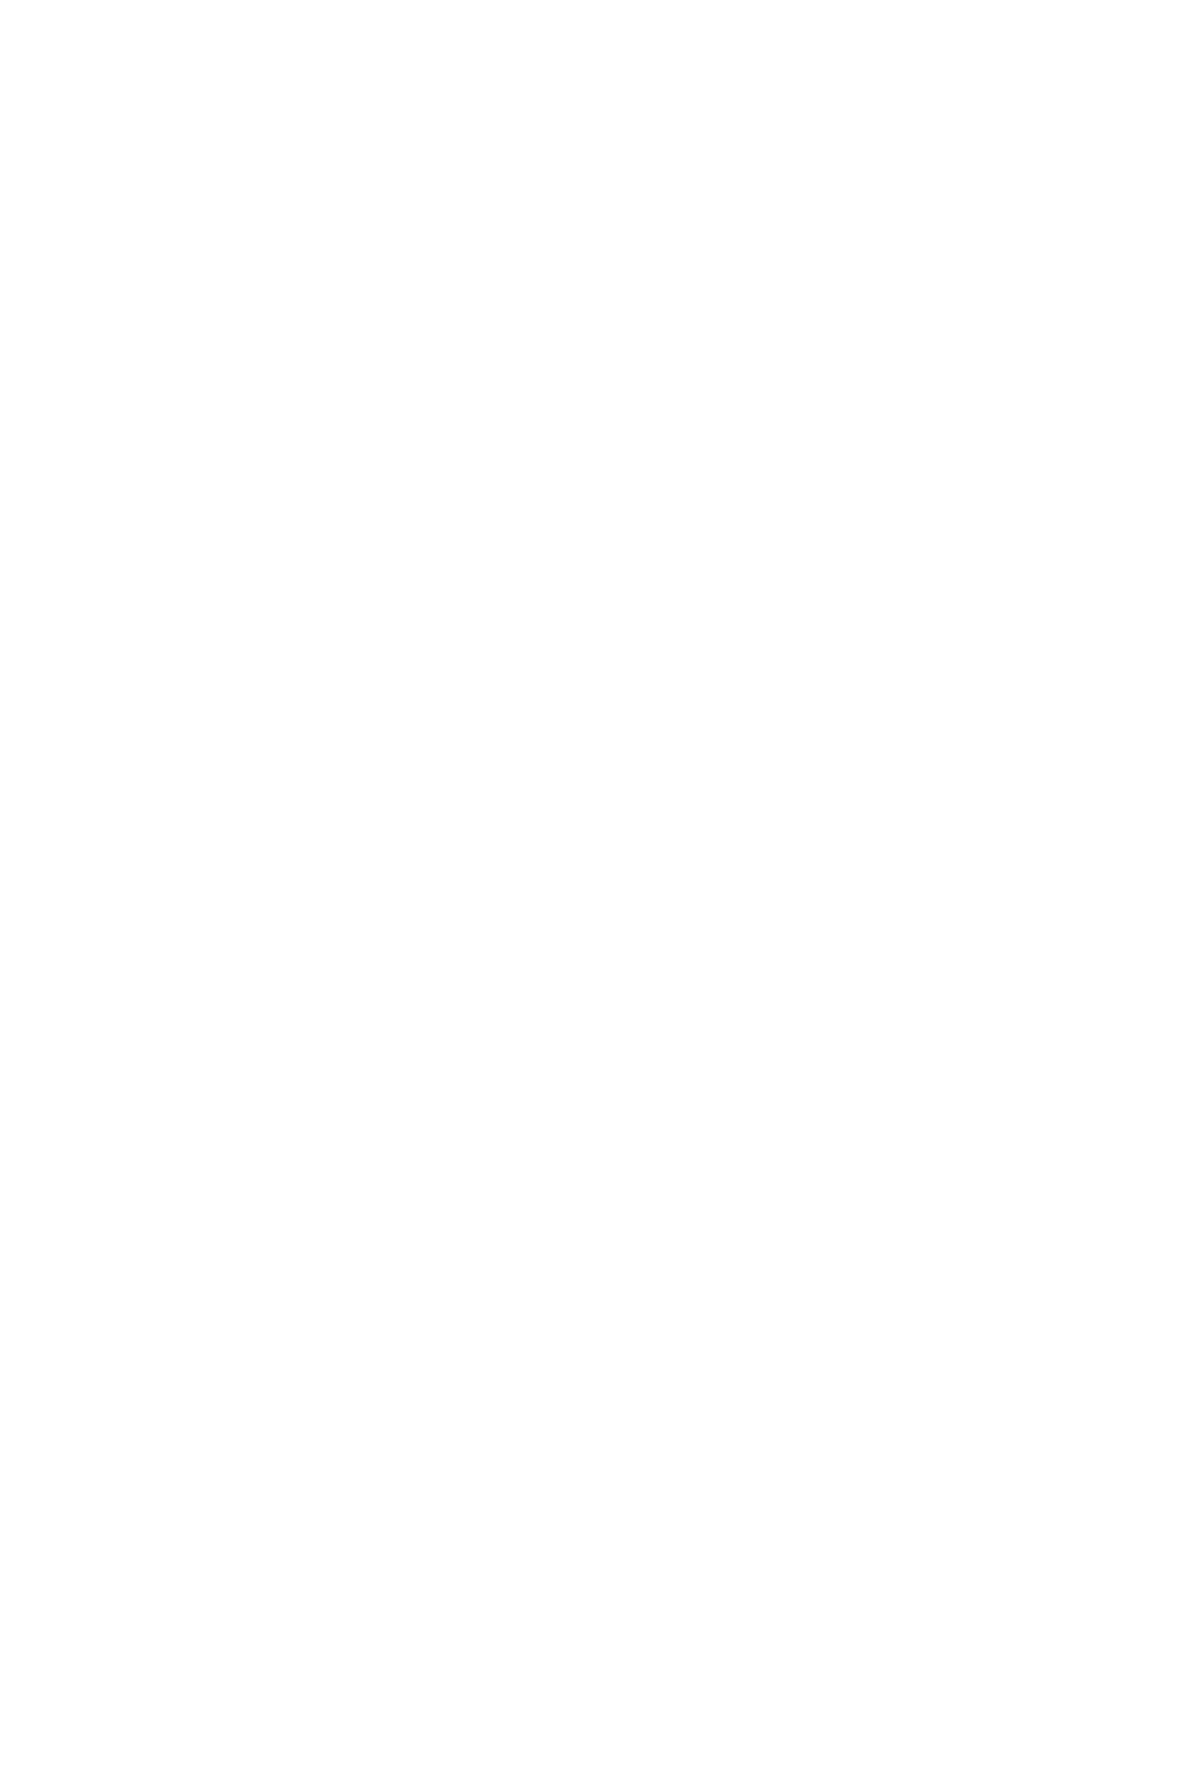 [Astro Creep (Matsuryu)] Sword Art Unlimited (Sword Art Online) [ENG]v2 29